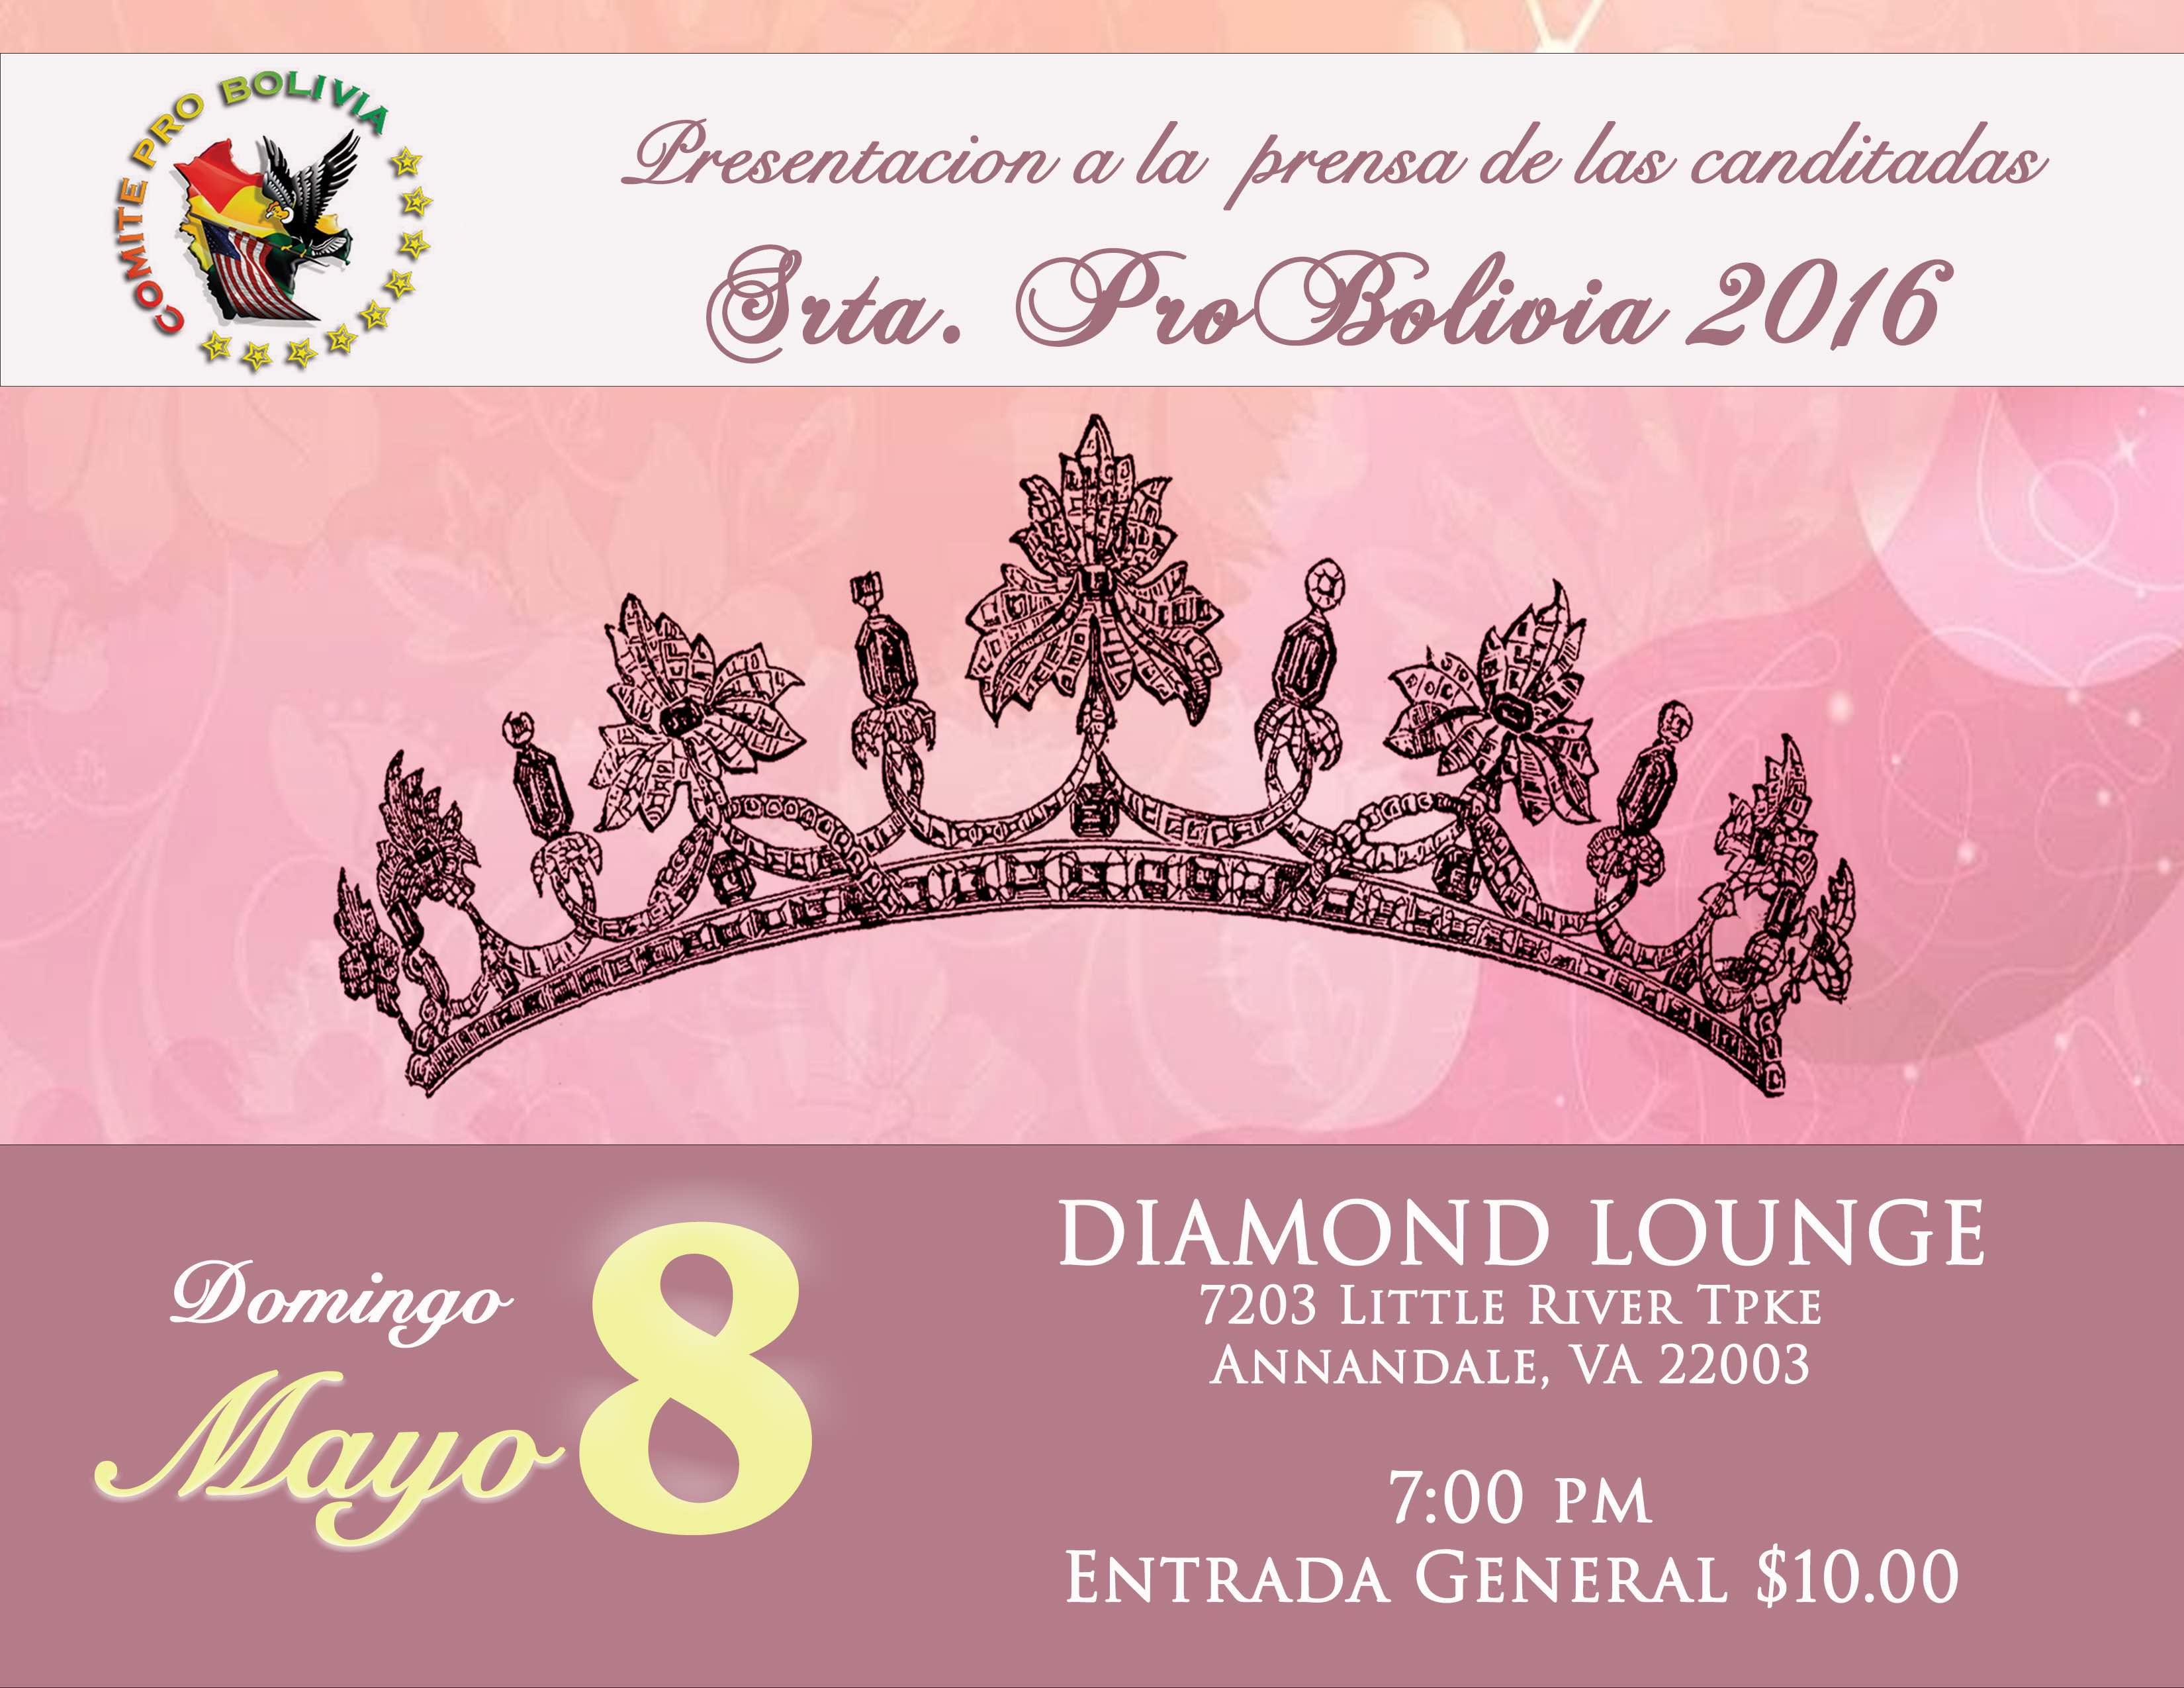 Miss Pro Bolivia 2016 - Presentation of candidates